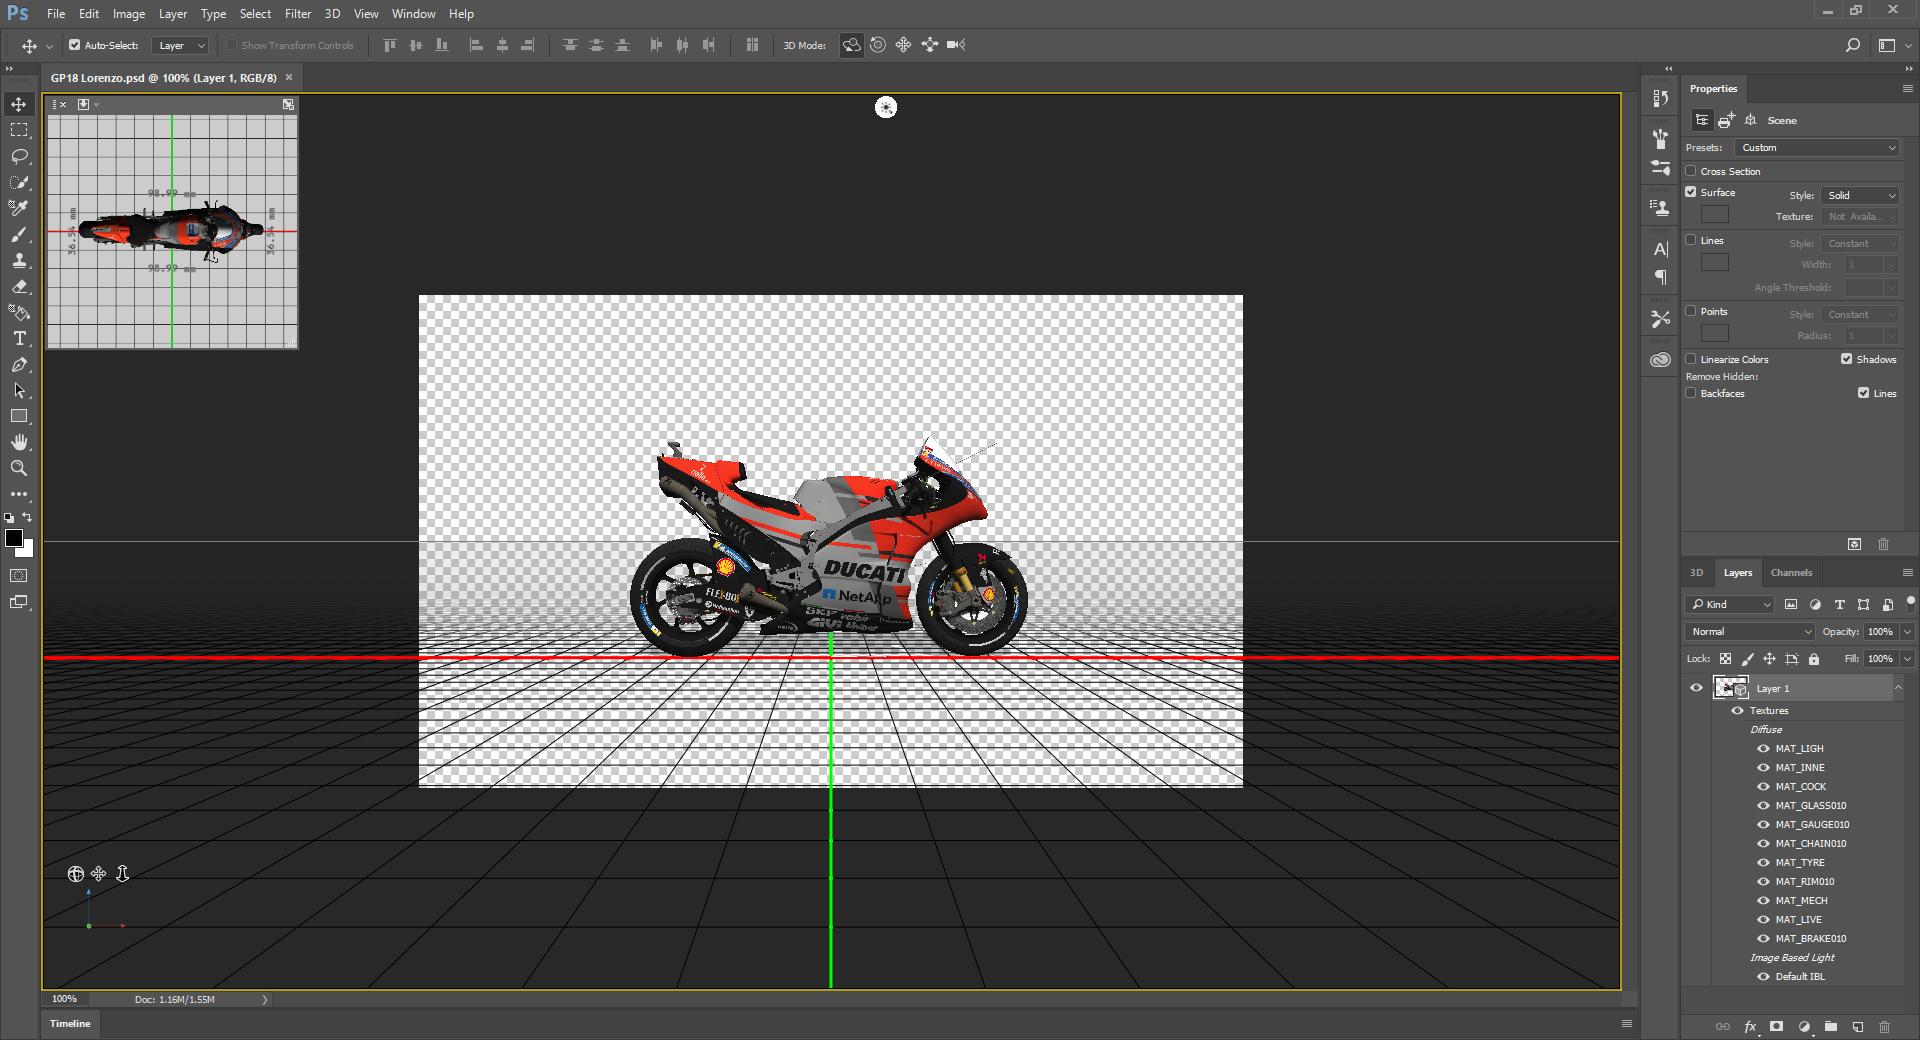 MotoGP Bike Models For Photoshop | RaceDepartment